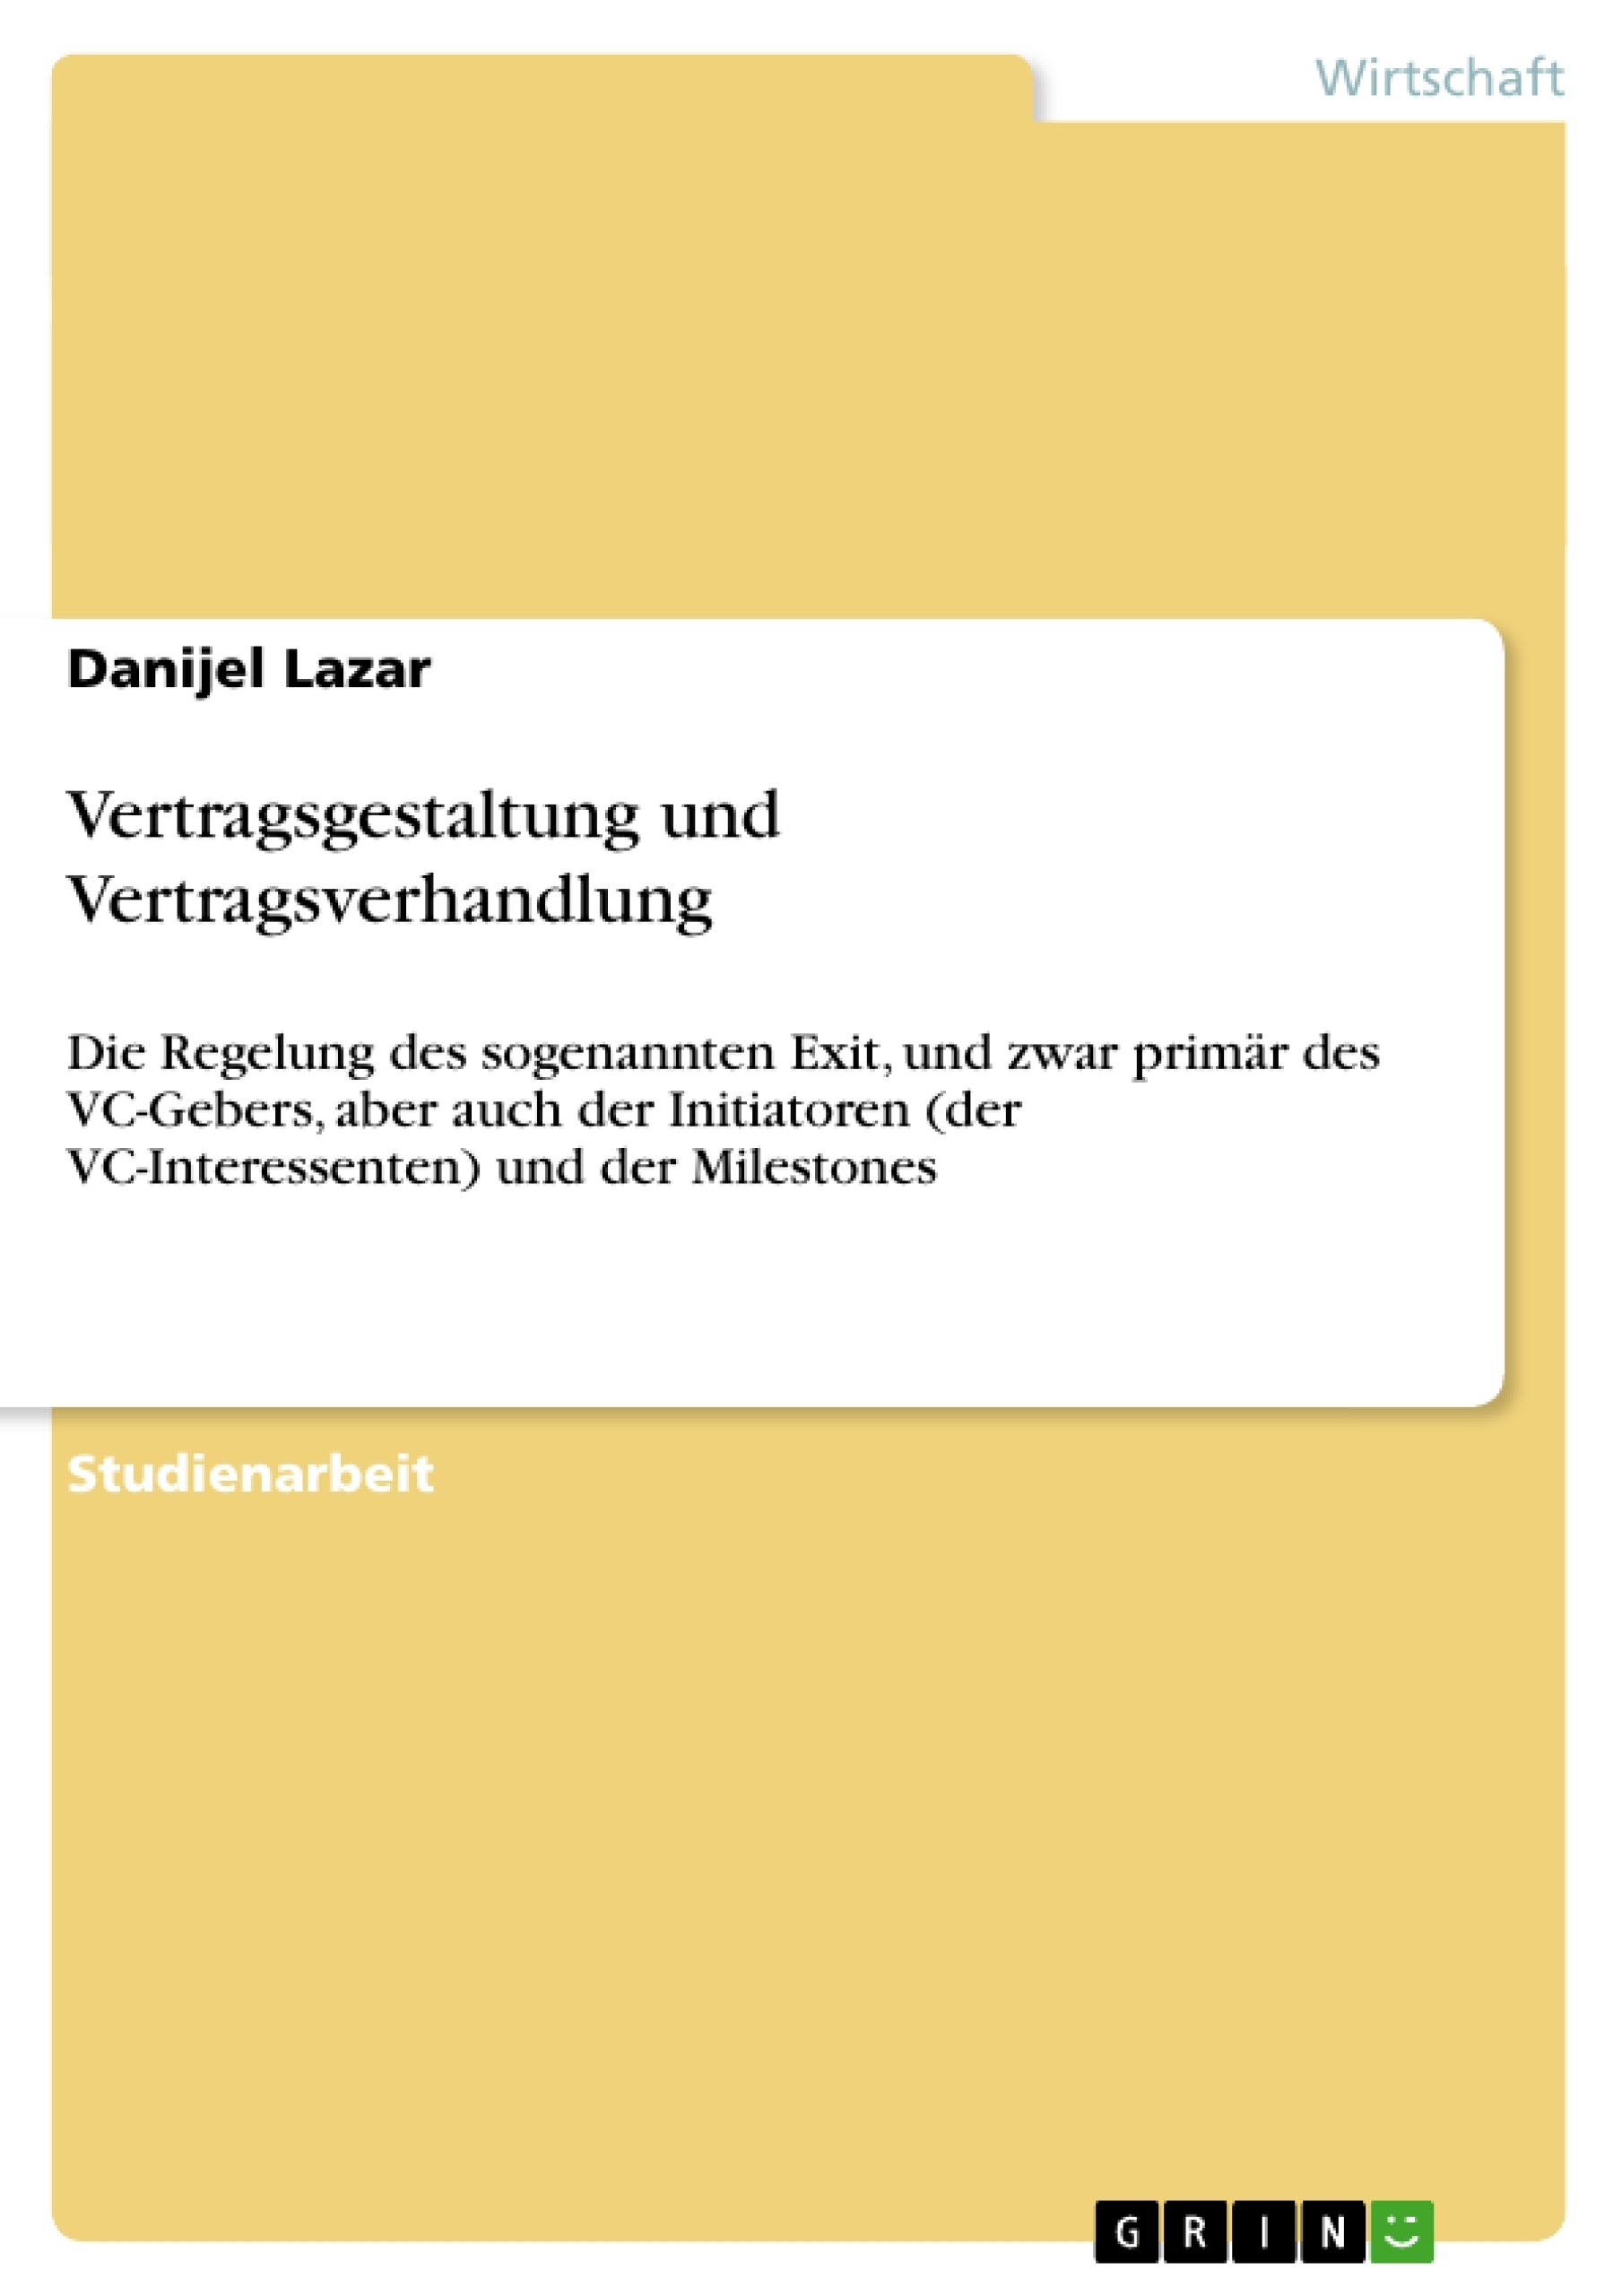 Titel: Vertragsgestaltung und Vertragsverhandlung